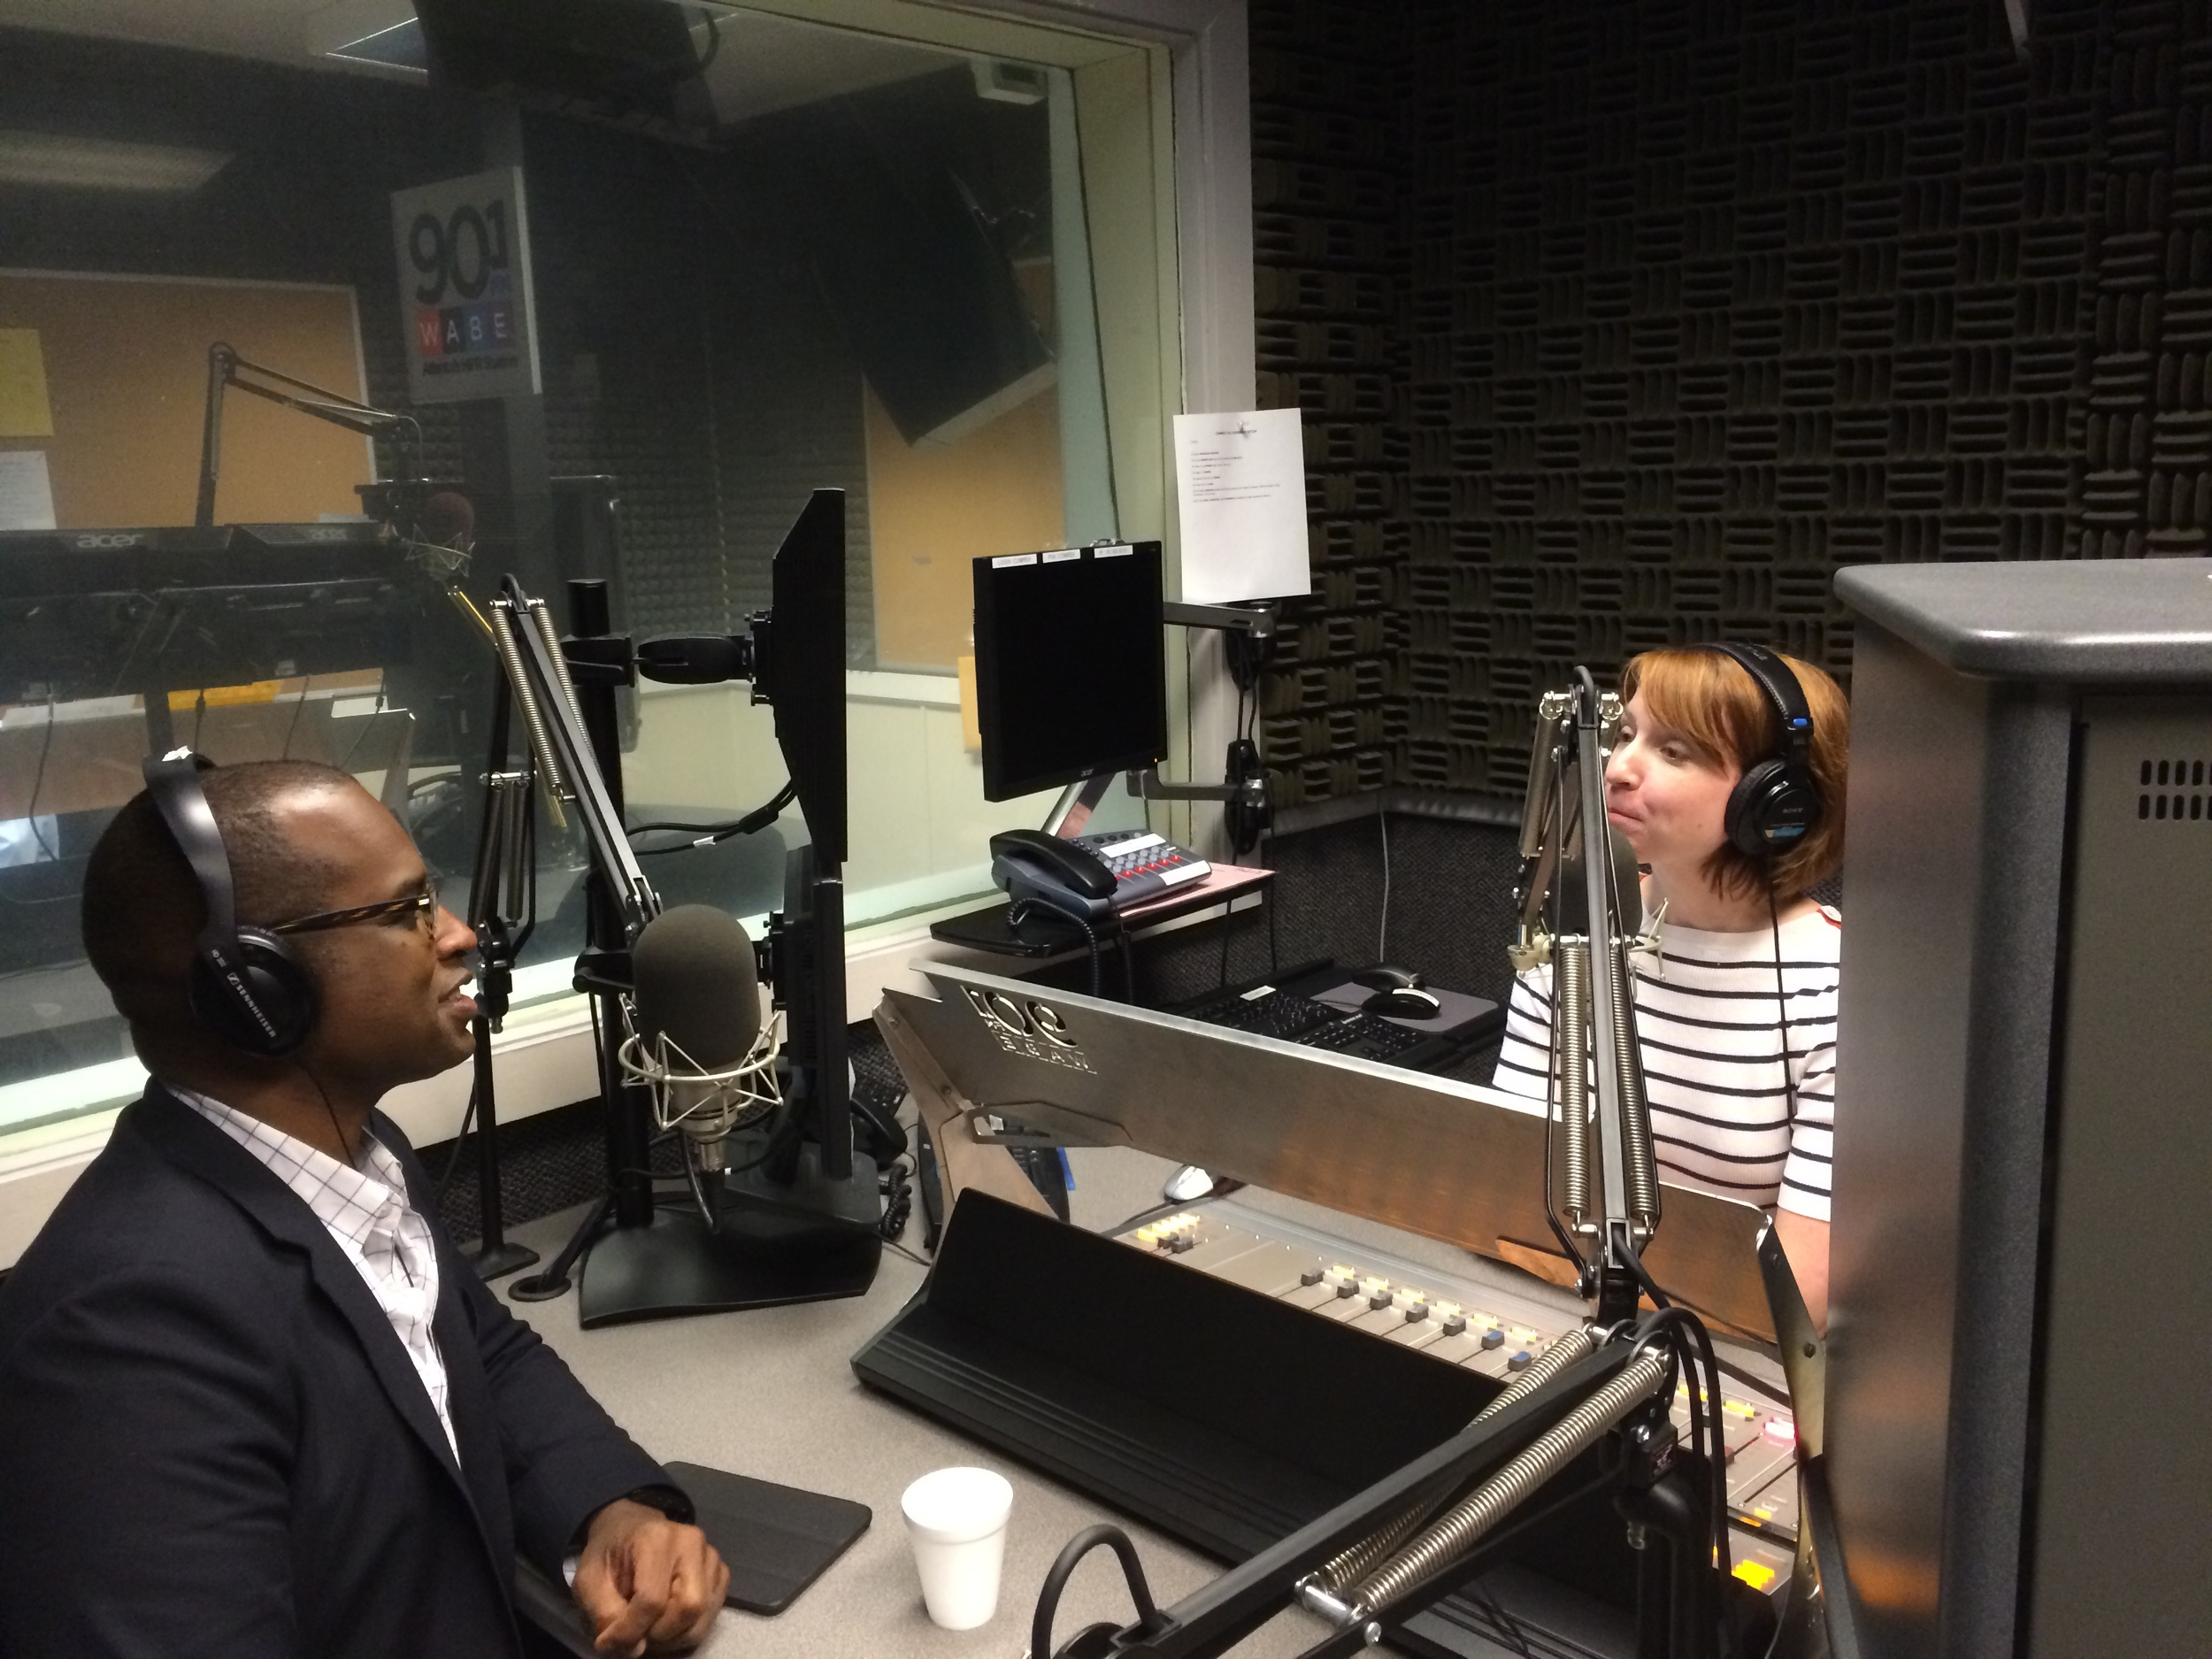 WABE's Kate Sweeney interviews Dr. Carter about sensation seeking.